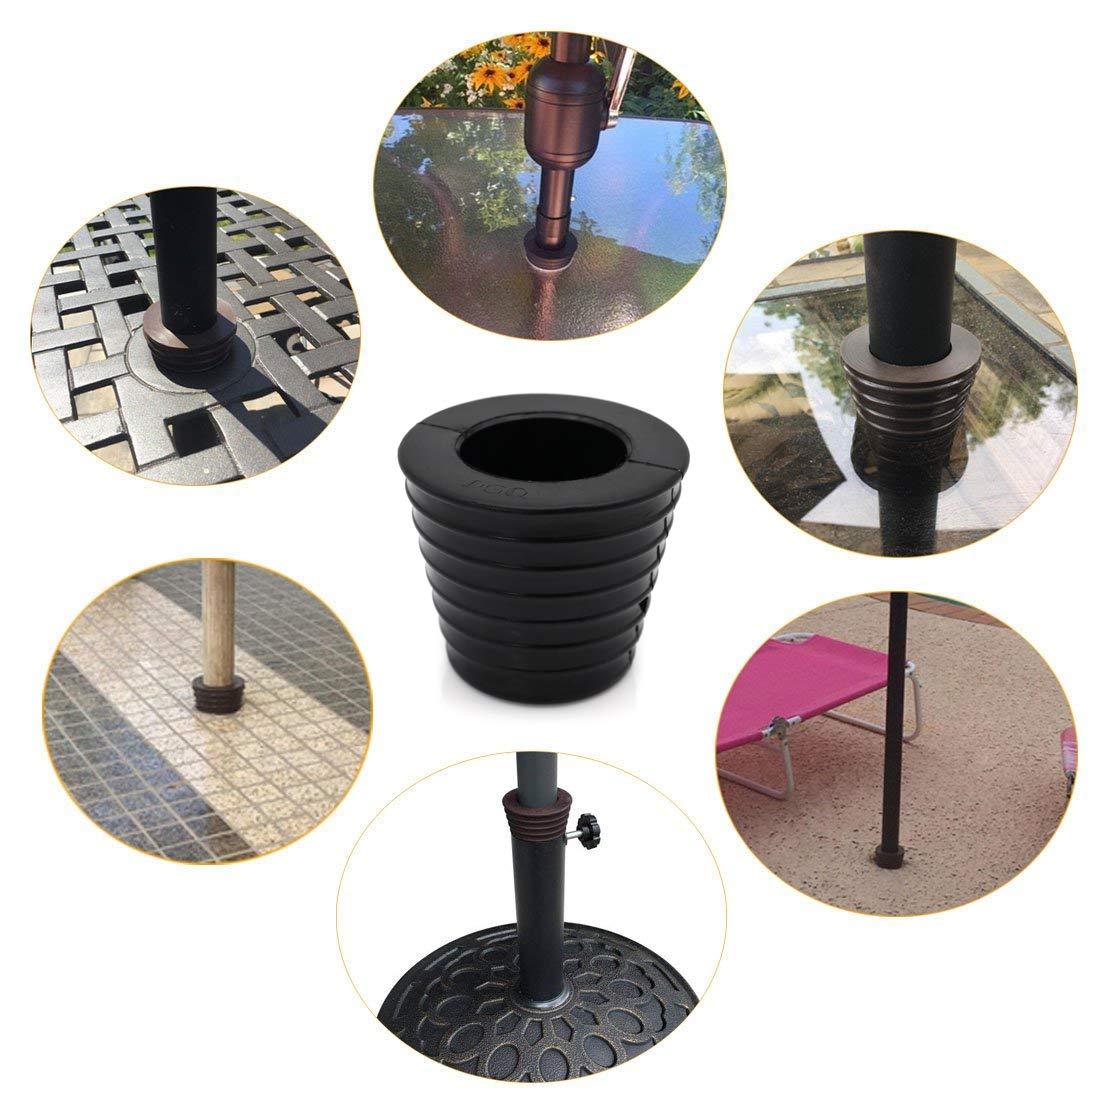 DGQ Patio Umbrella Cone Umbrella Wedge Plug Fits 1.5 Umbrella for Patio Table Hole Opening 2.5 Inch /… Black